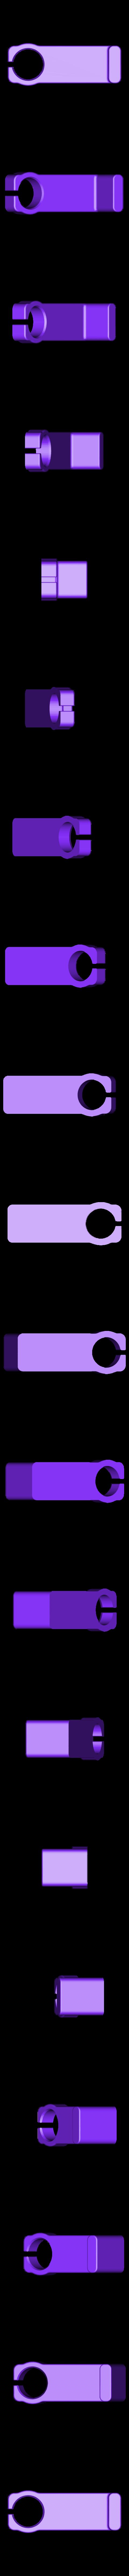 Rod.stl Download STL file Armillary phone Holder • Design to 3D print, 3d-fabric-jean-pierre